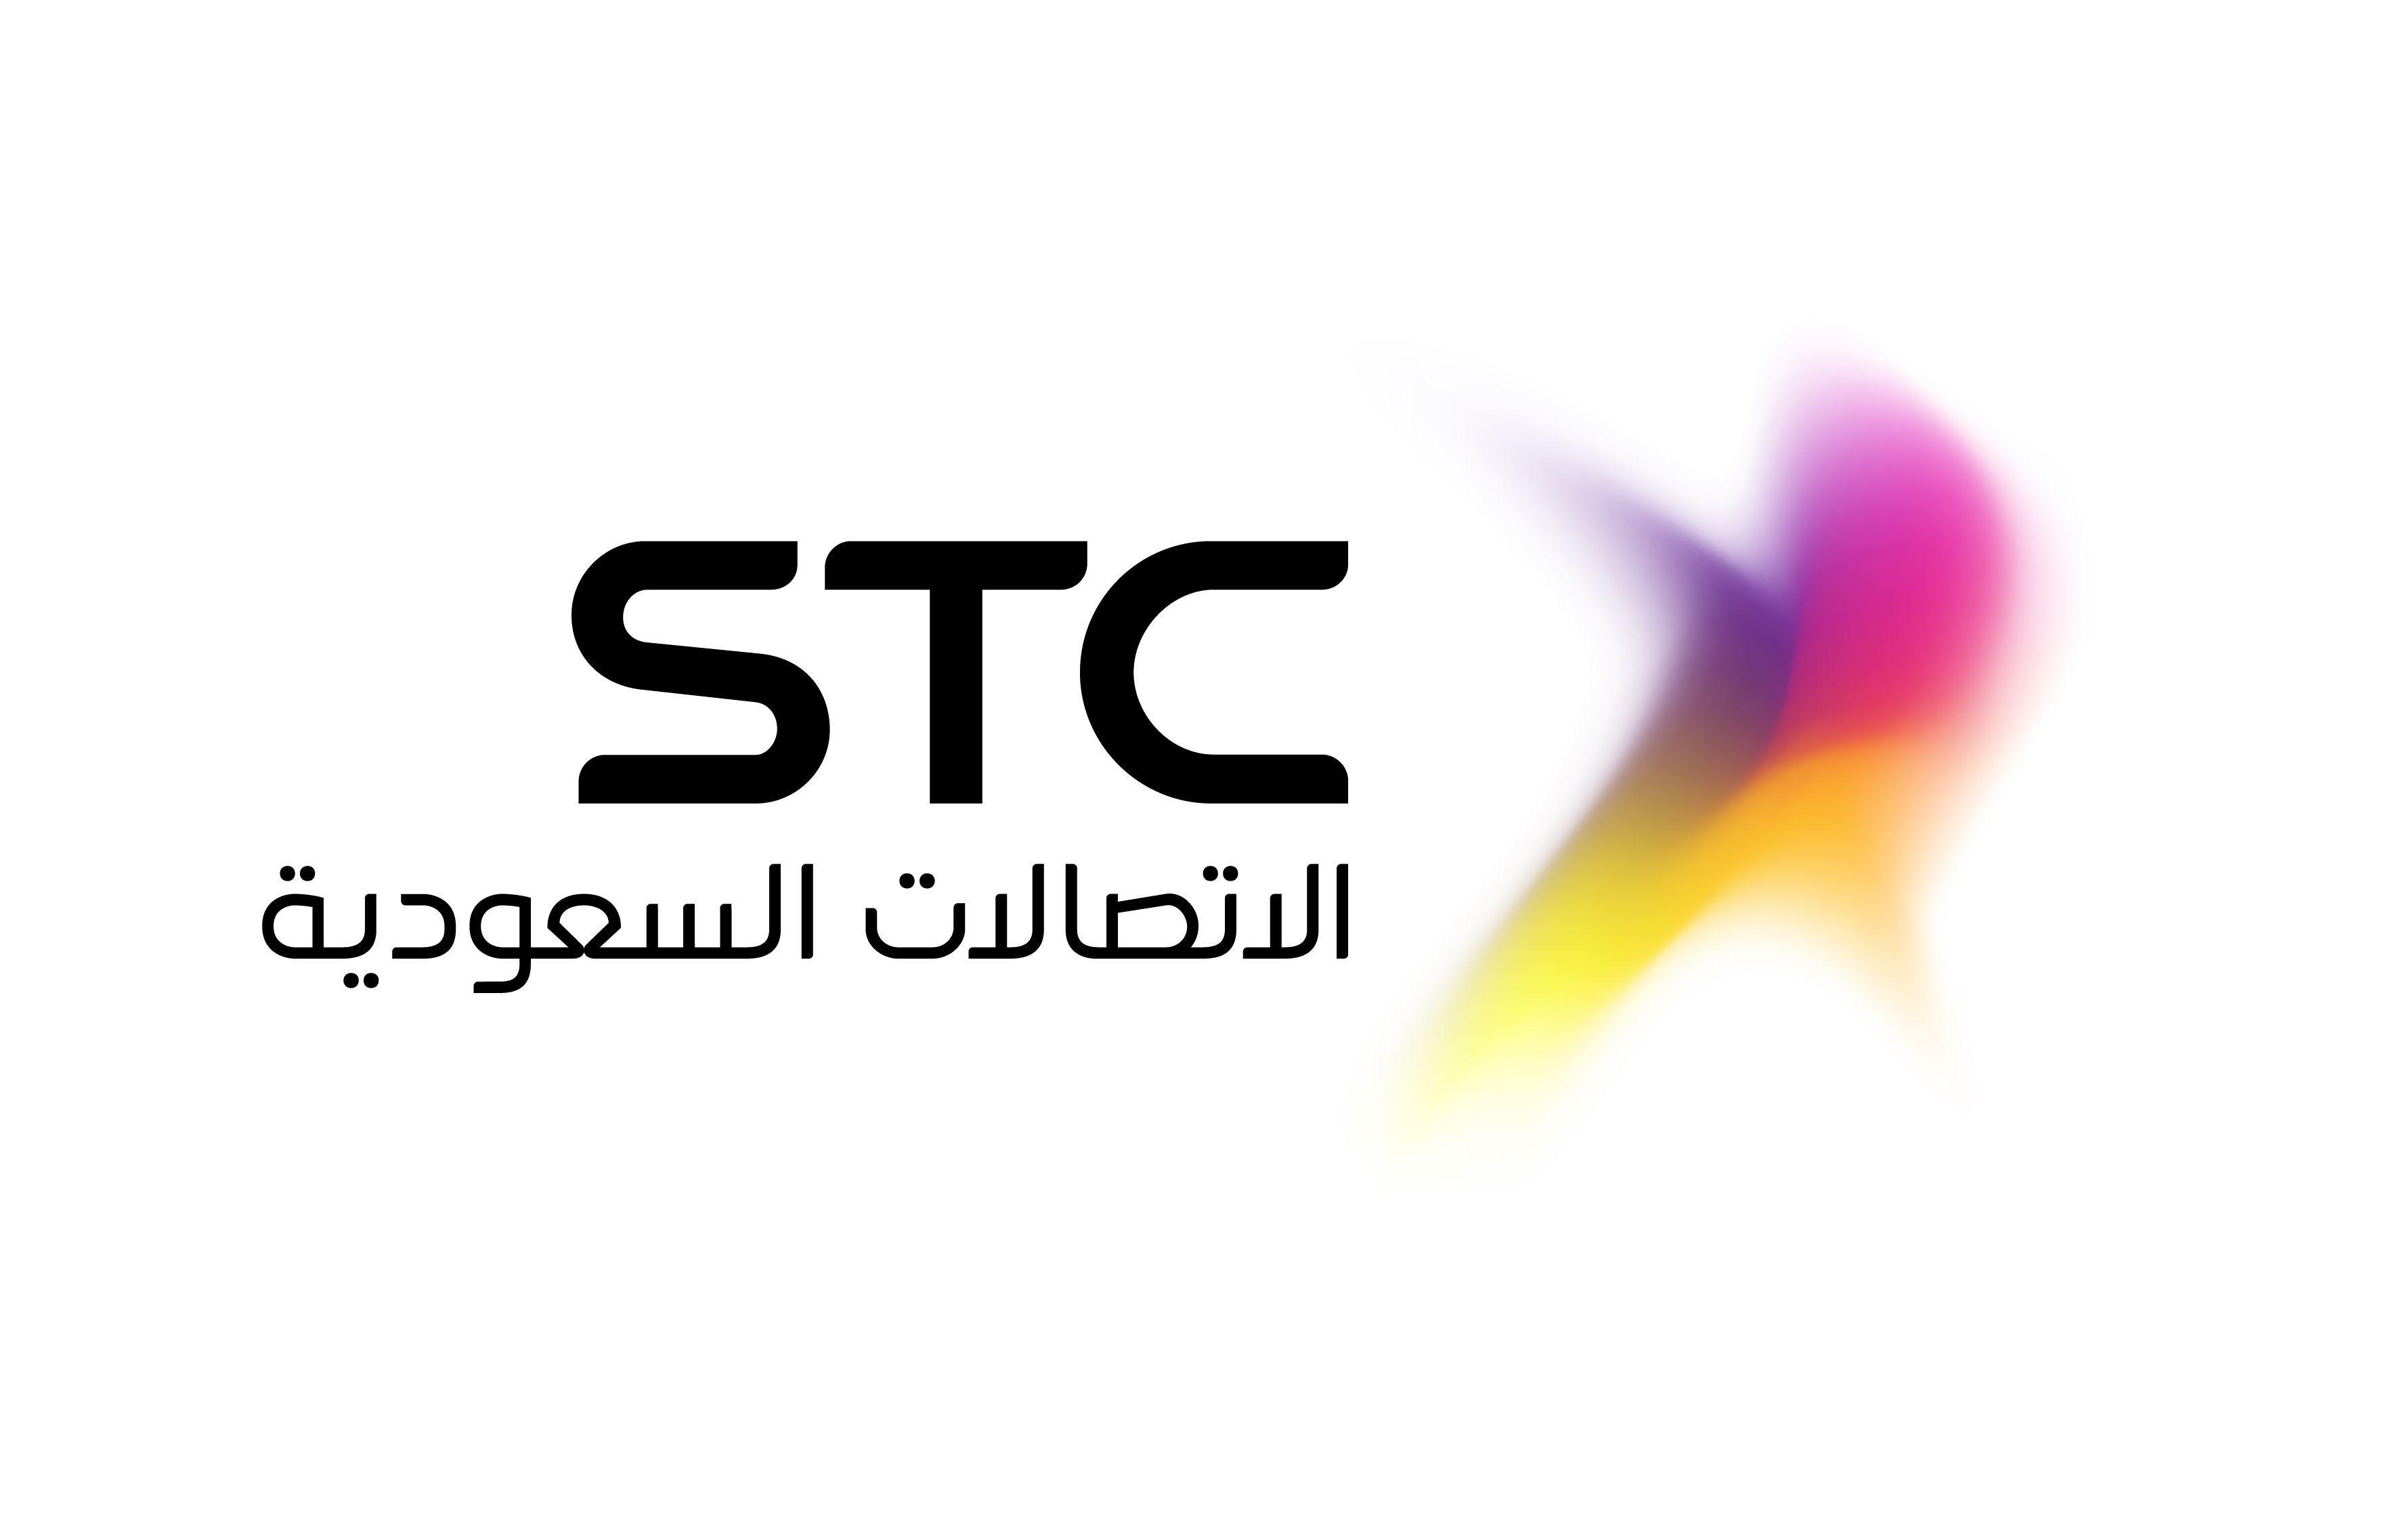 Stc تستقبل الدفعة الثالثة من طلبات الانضمام لحاضنة الأعمال انسبايريو New Technology Digital Technology